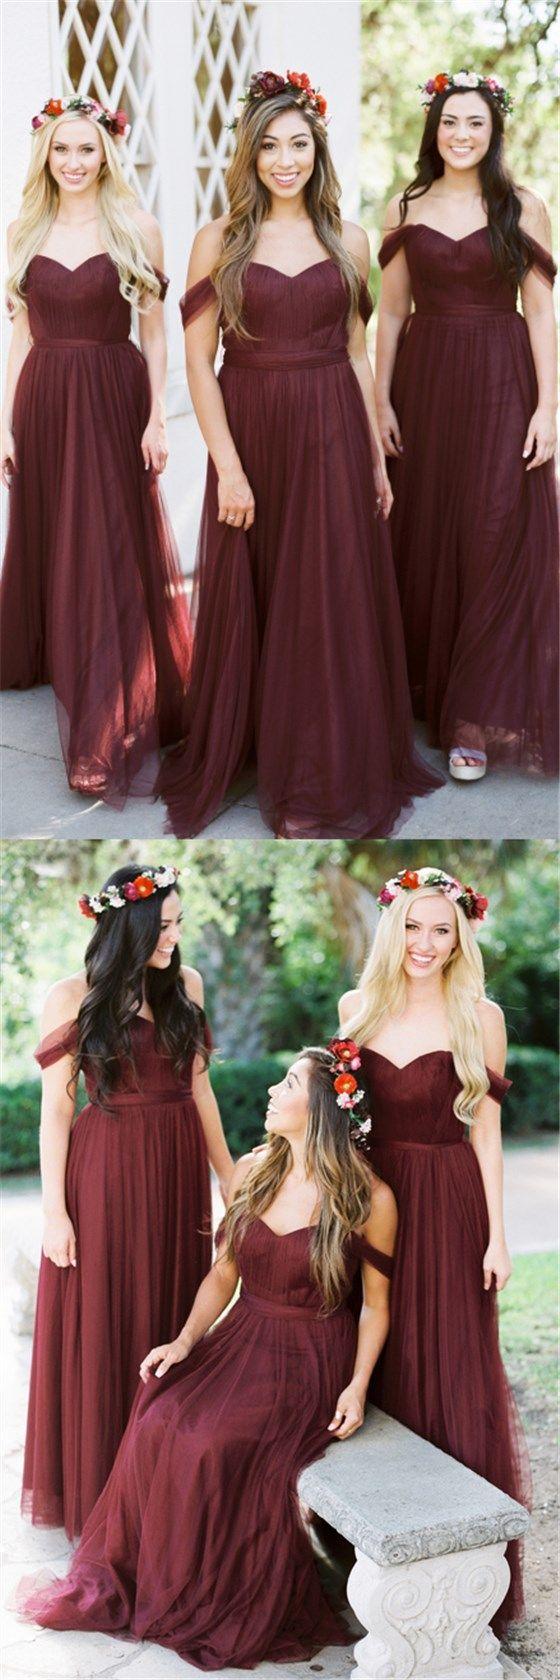 New Arrival Formal Elegant Long Bridesmaid Dresses, Custom Popular Bridesmaid Dress,PD0344 #charmingdressy #fashion #shopping #wedding#bridesmaiddresses